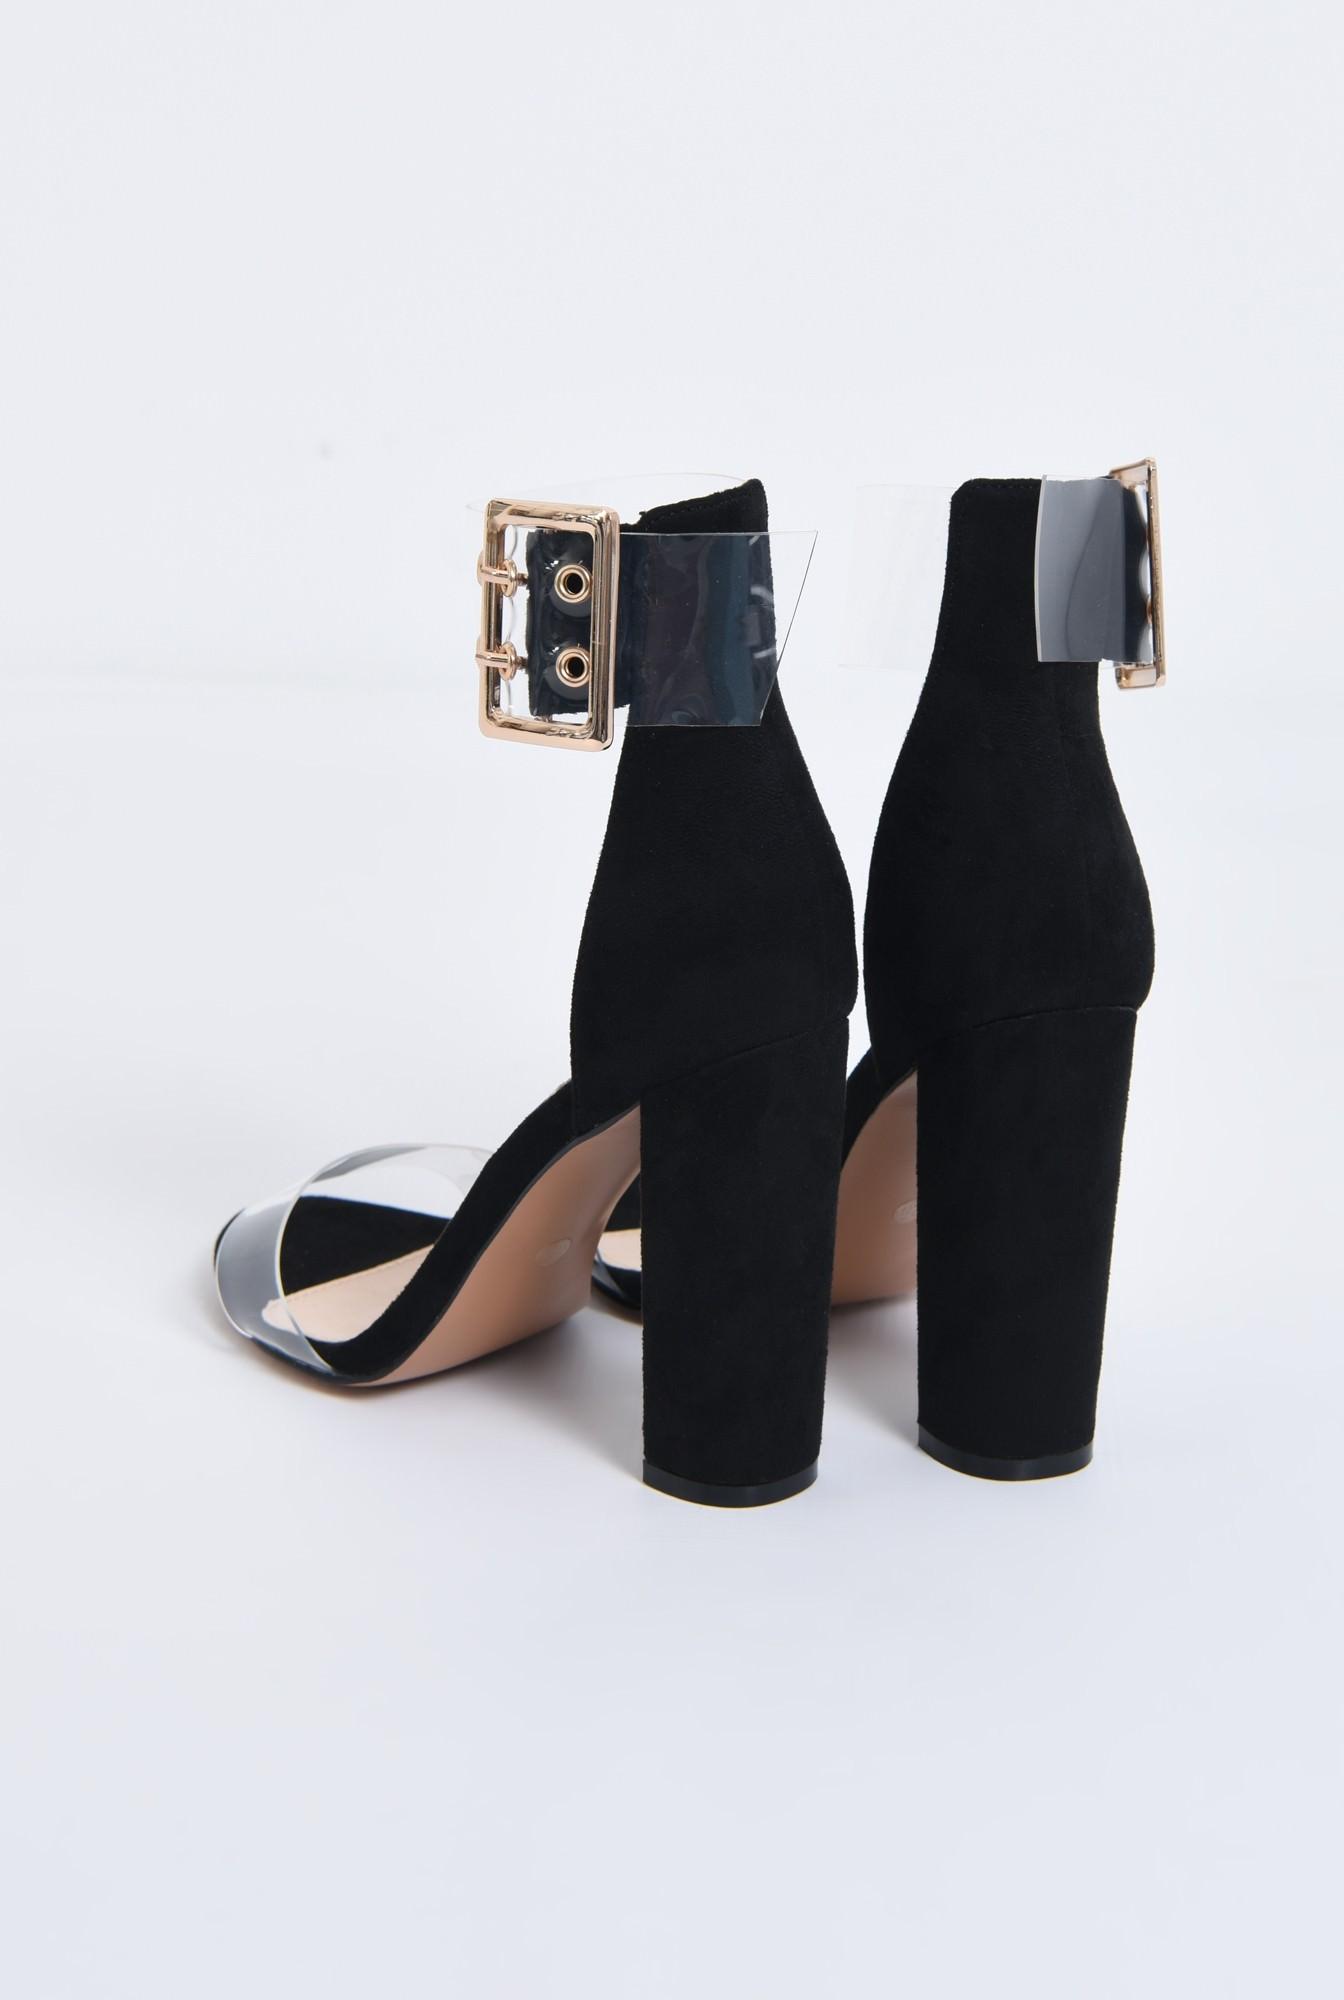 4 - sandale dama, toc gros, capse, auriu